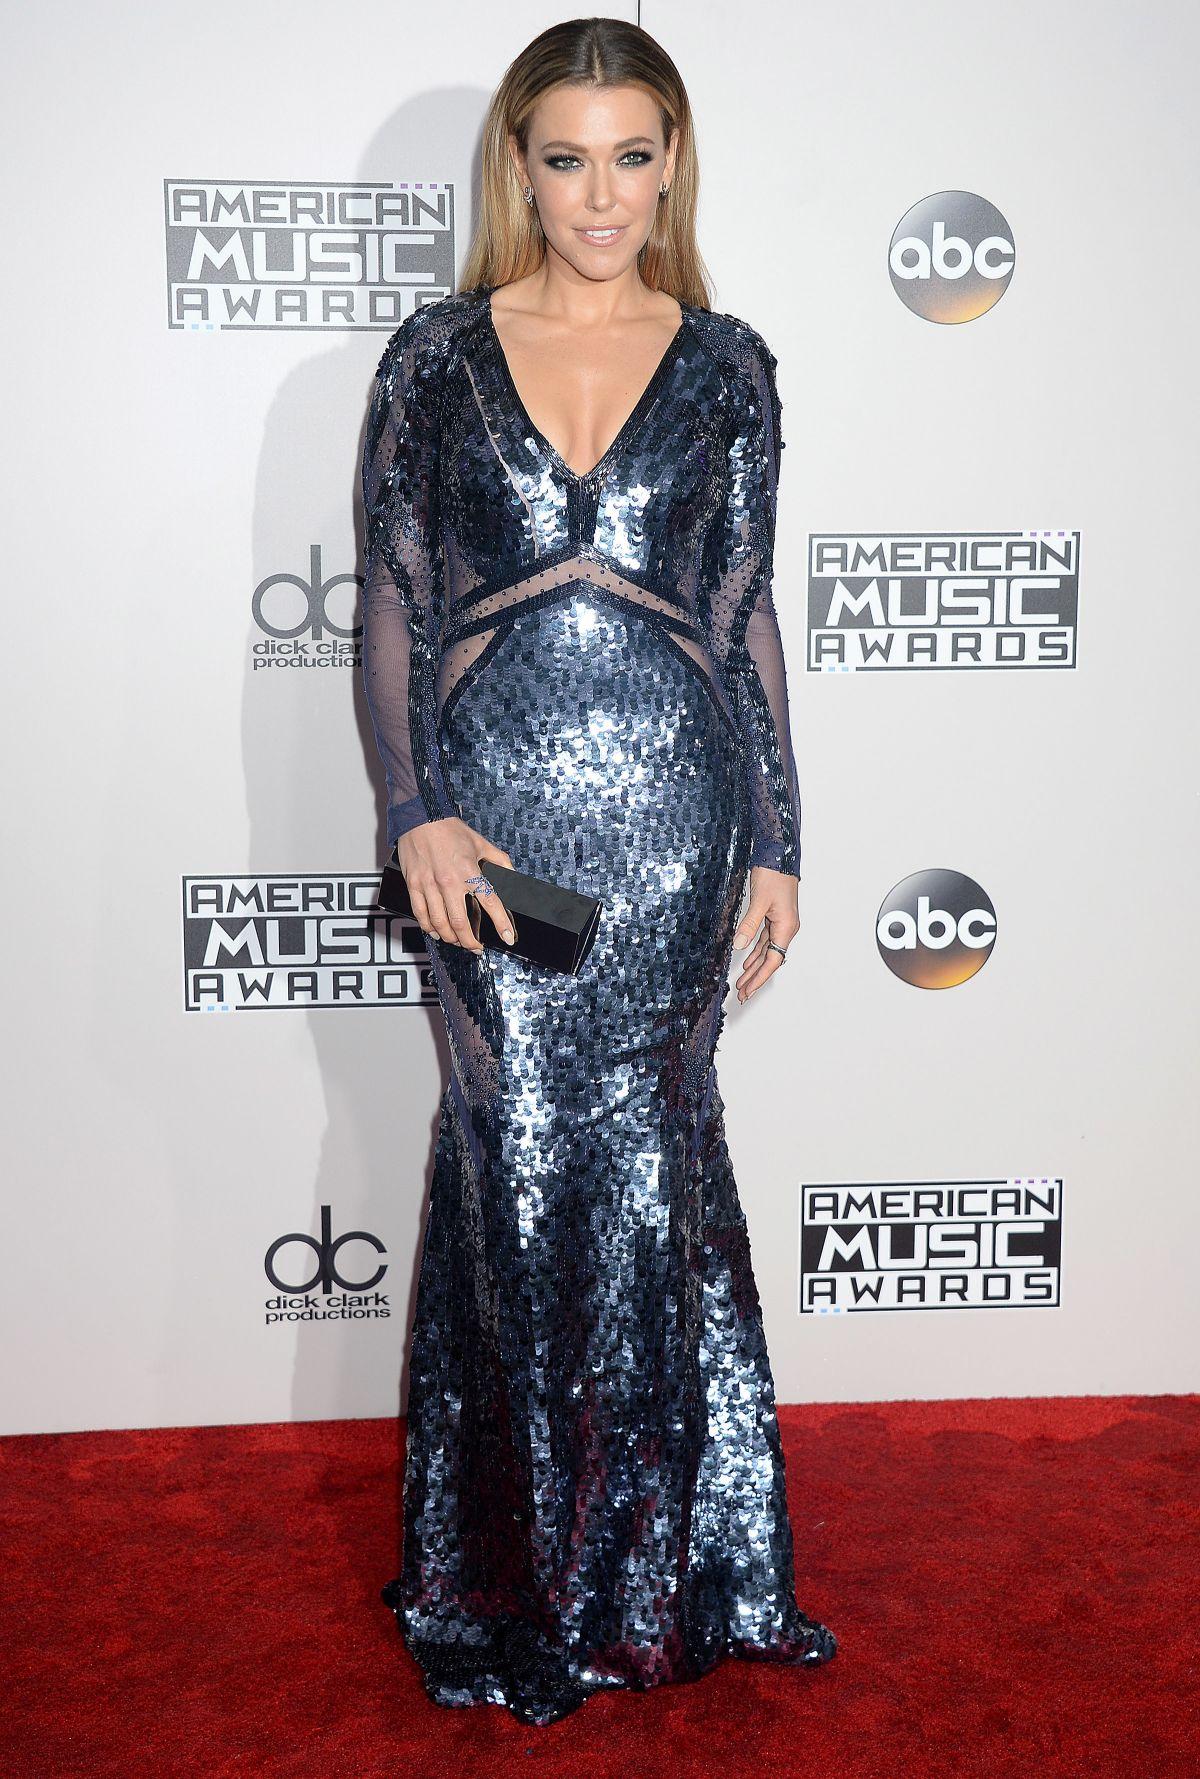 13Q6J6q Rachel Platten – Certified Gold American Singer